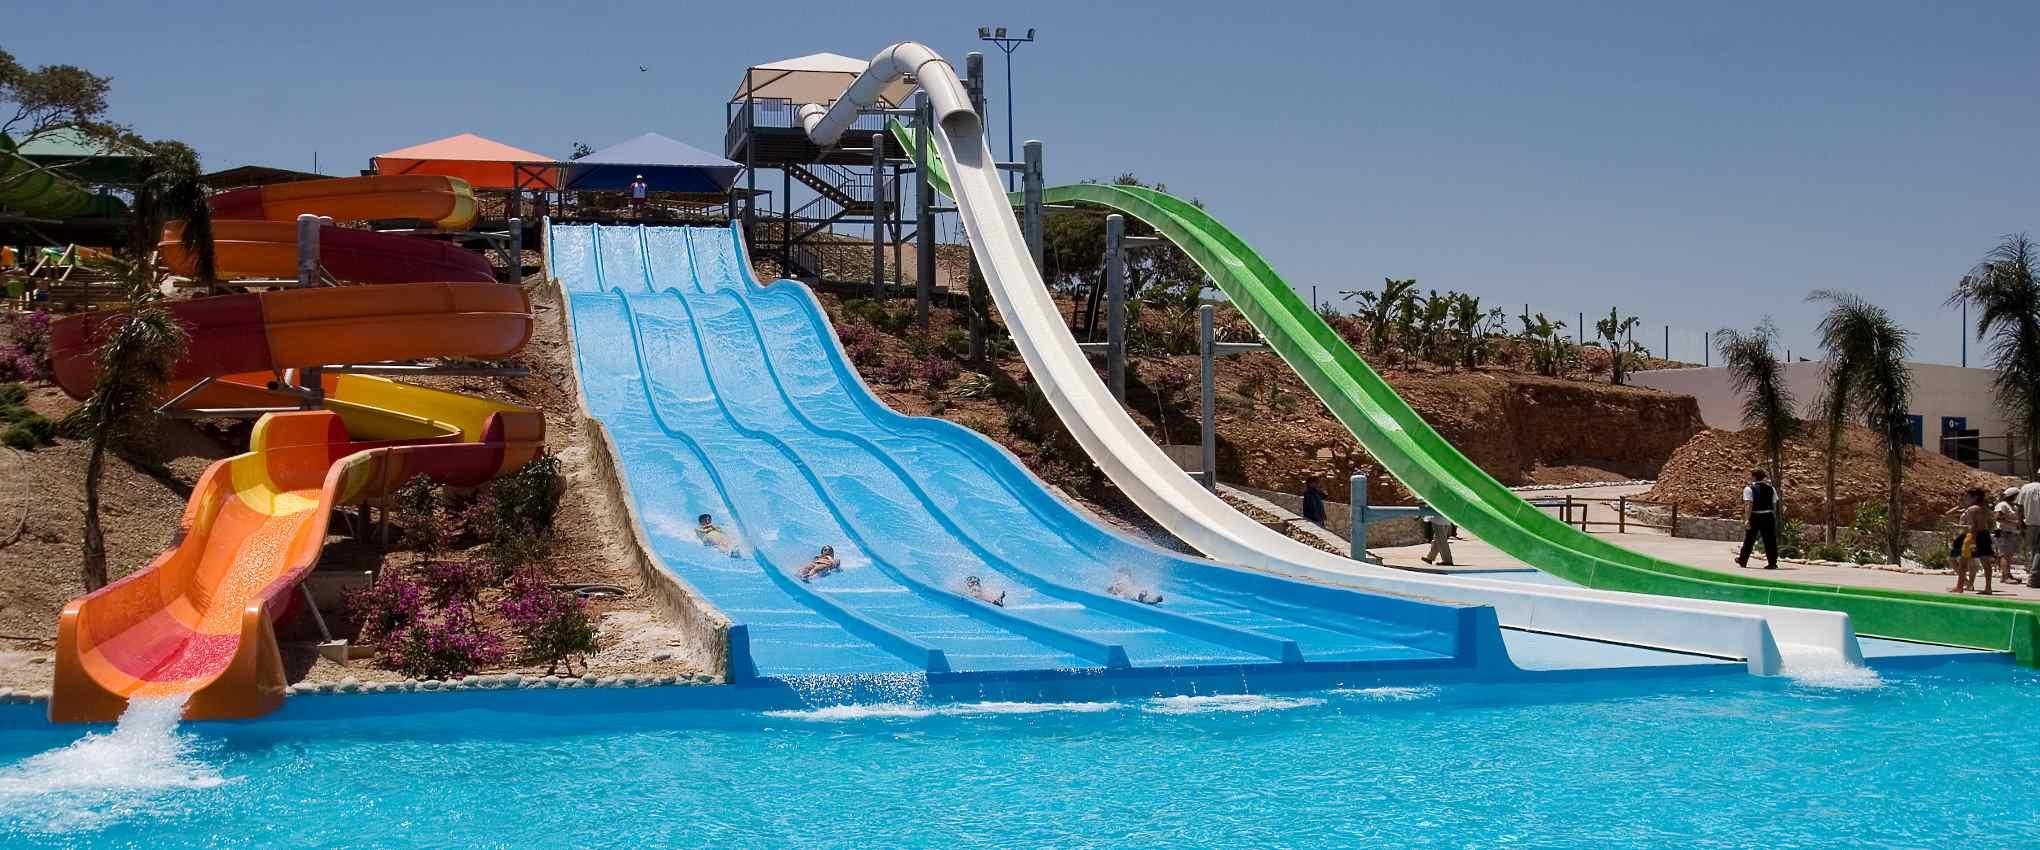 Wasserpark Murcia